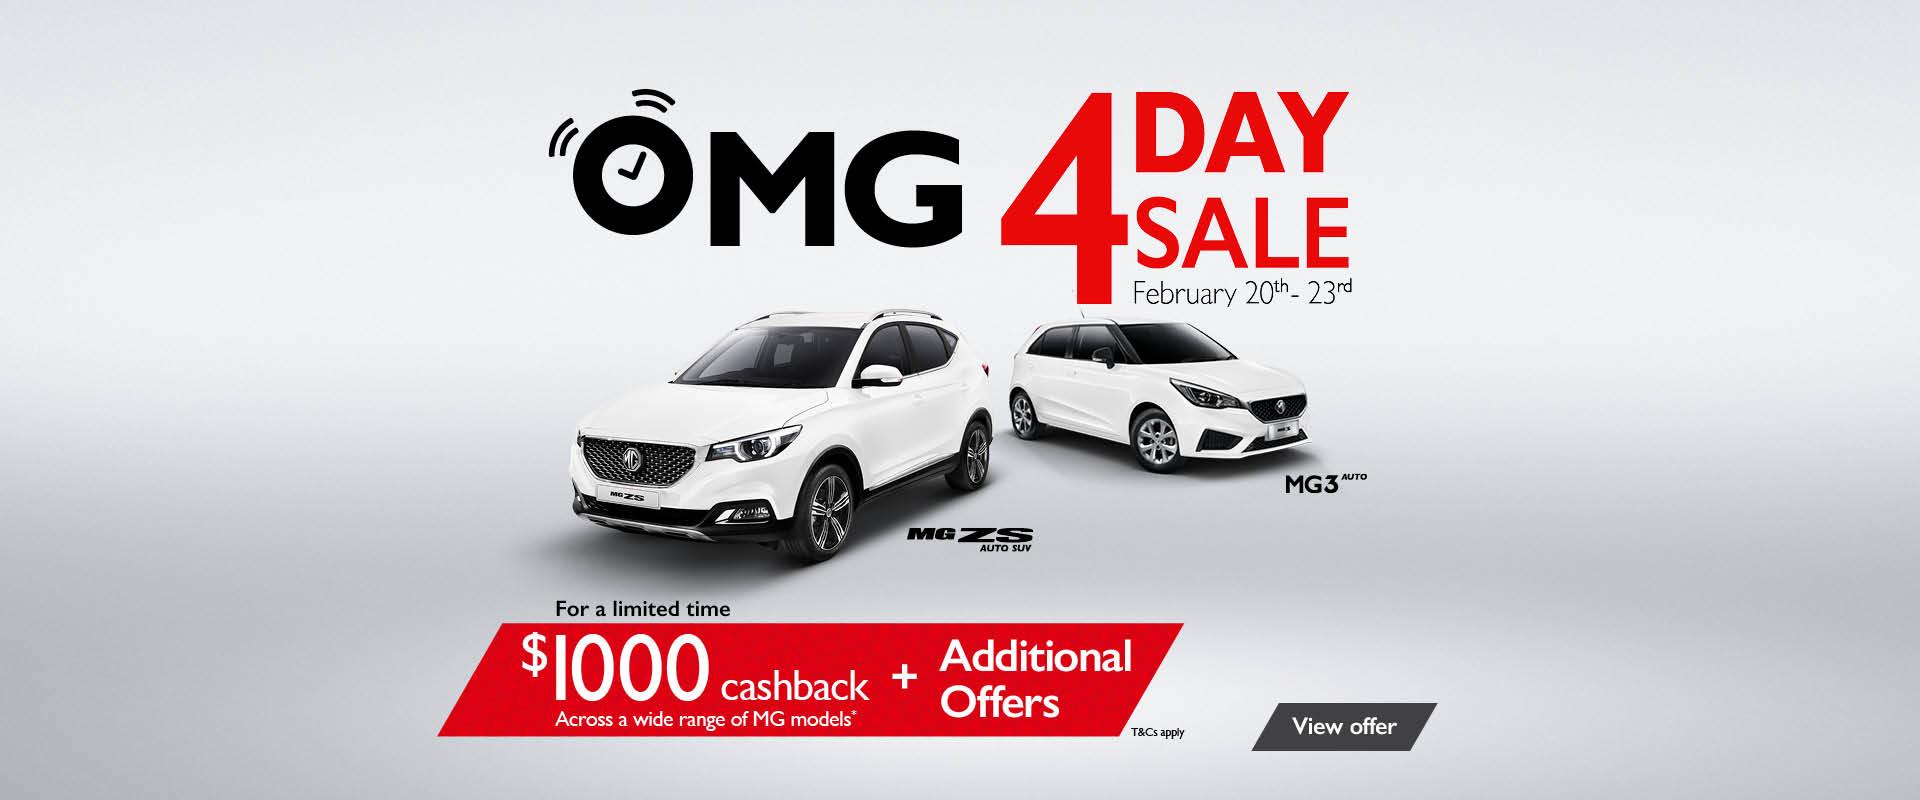 OMG 4 Day Sale Macarthur MG